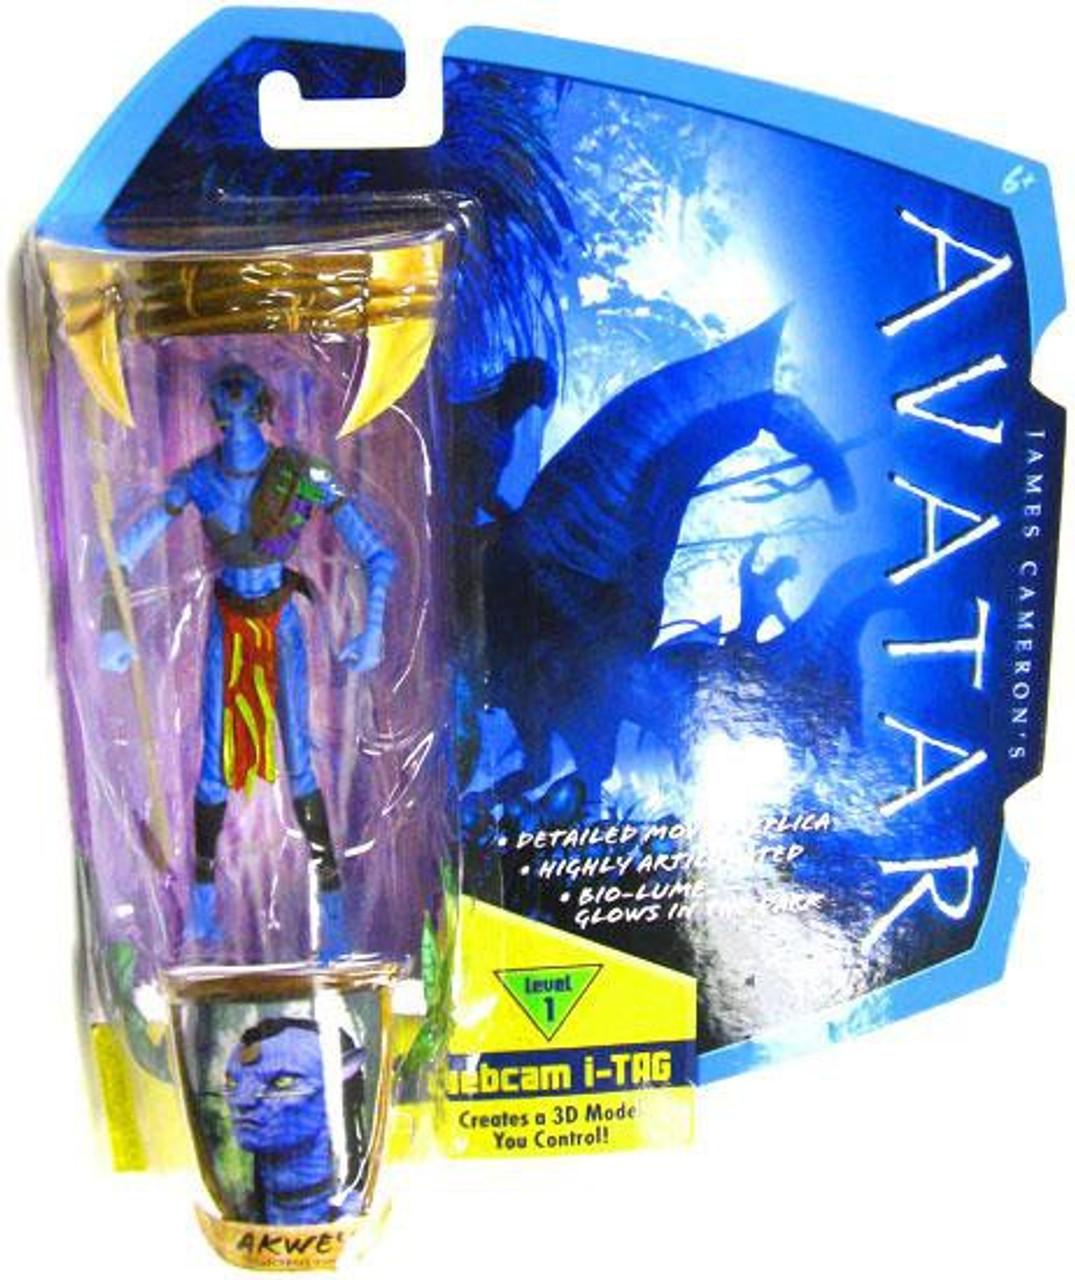 Avatar 2 Toys: James Camerons Avatar Akwey 3.75 Action Figure Mattel Toys